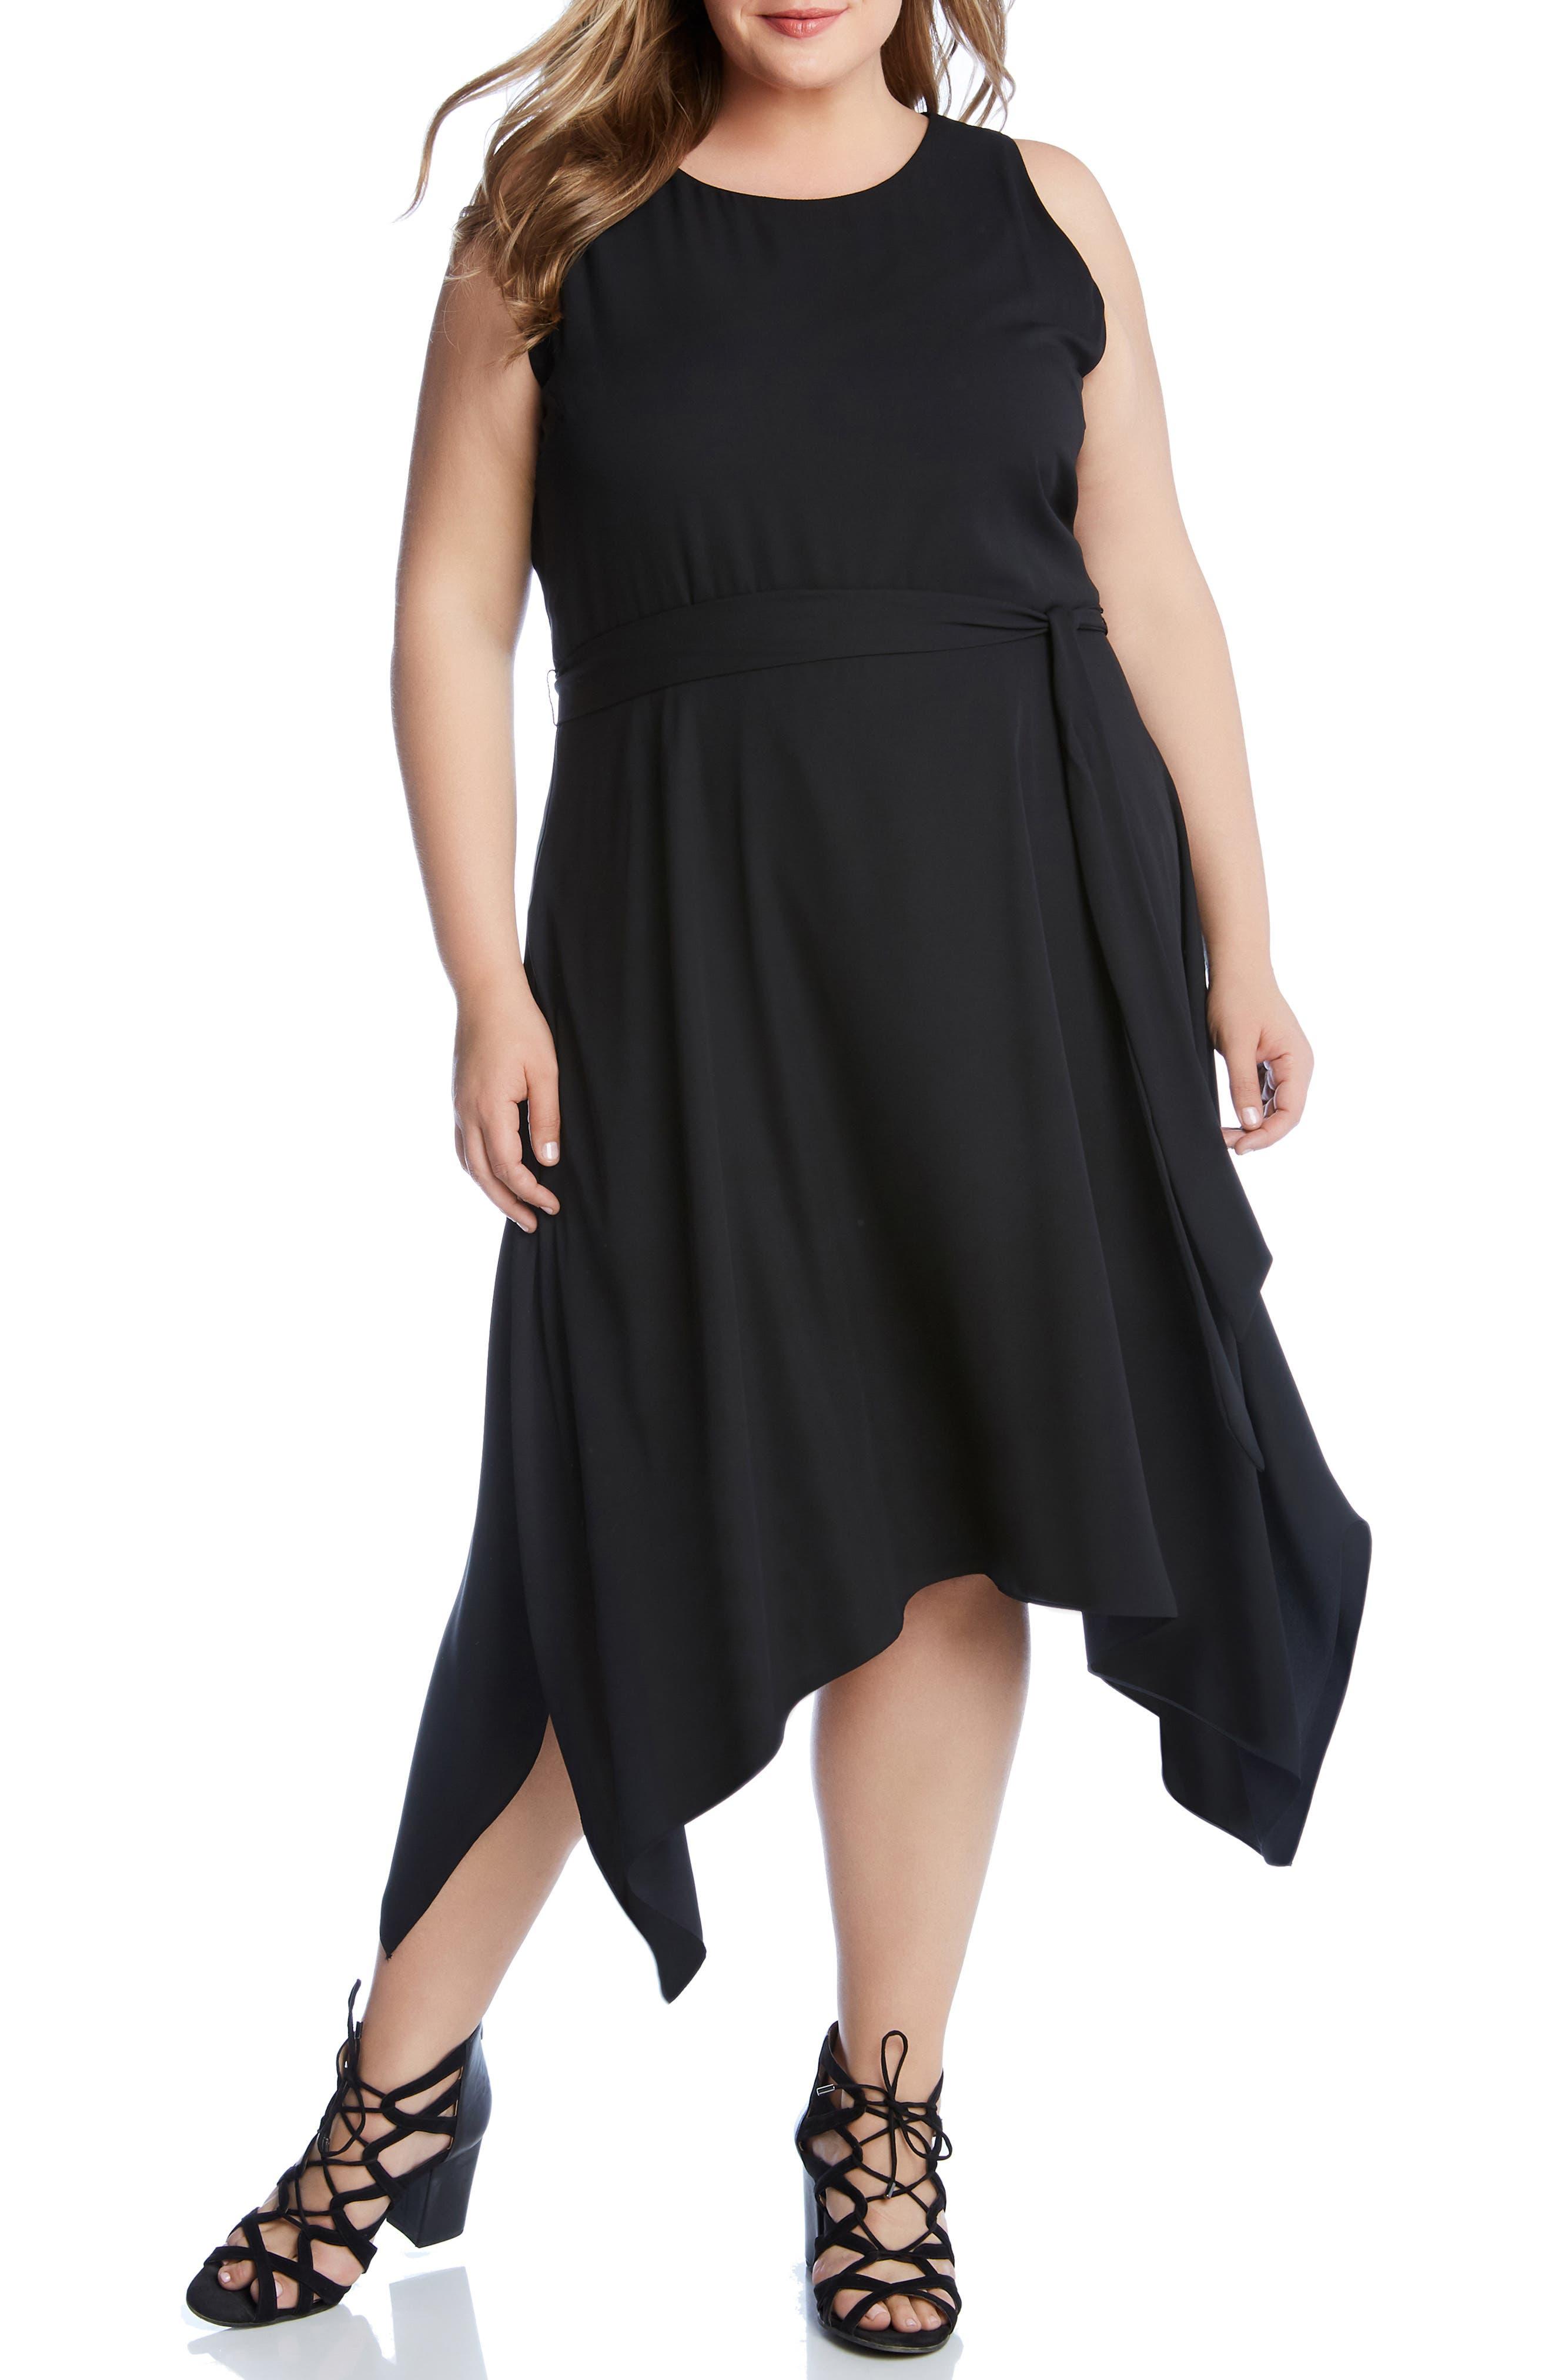 KAREN KANE, Sleeveless Handkerchief Hem Dress, Main thumbnail 1, color, BLACK